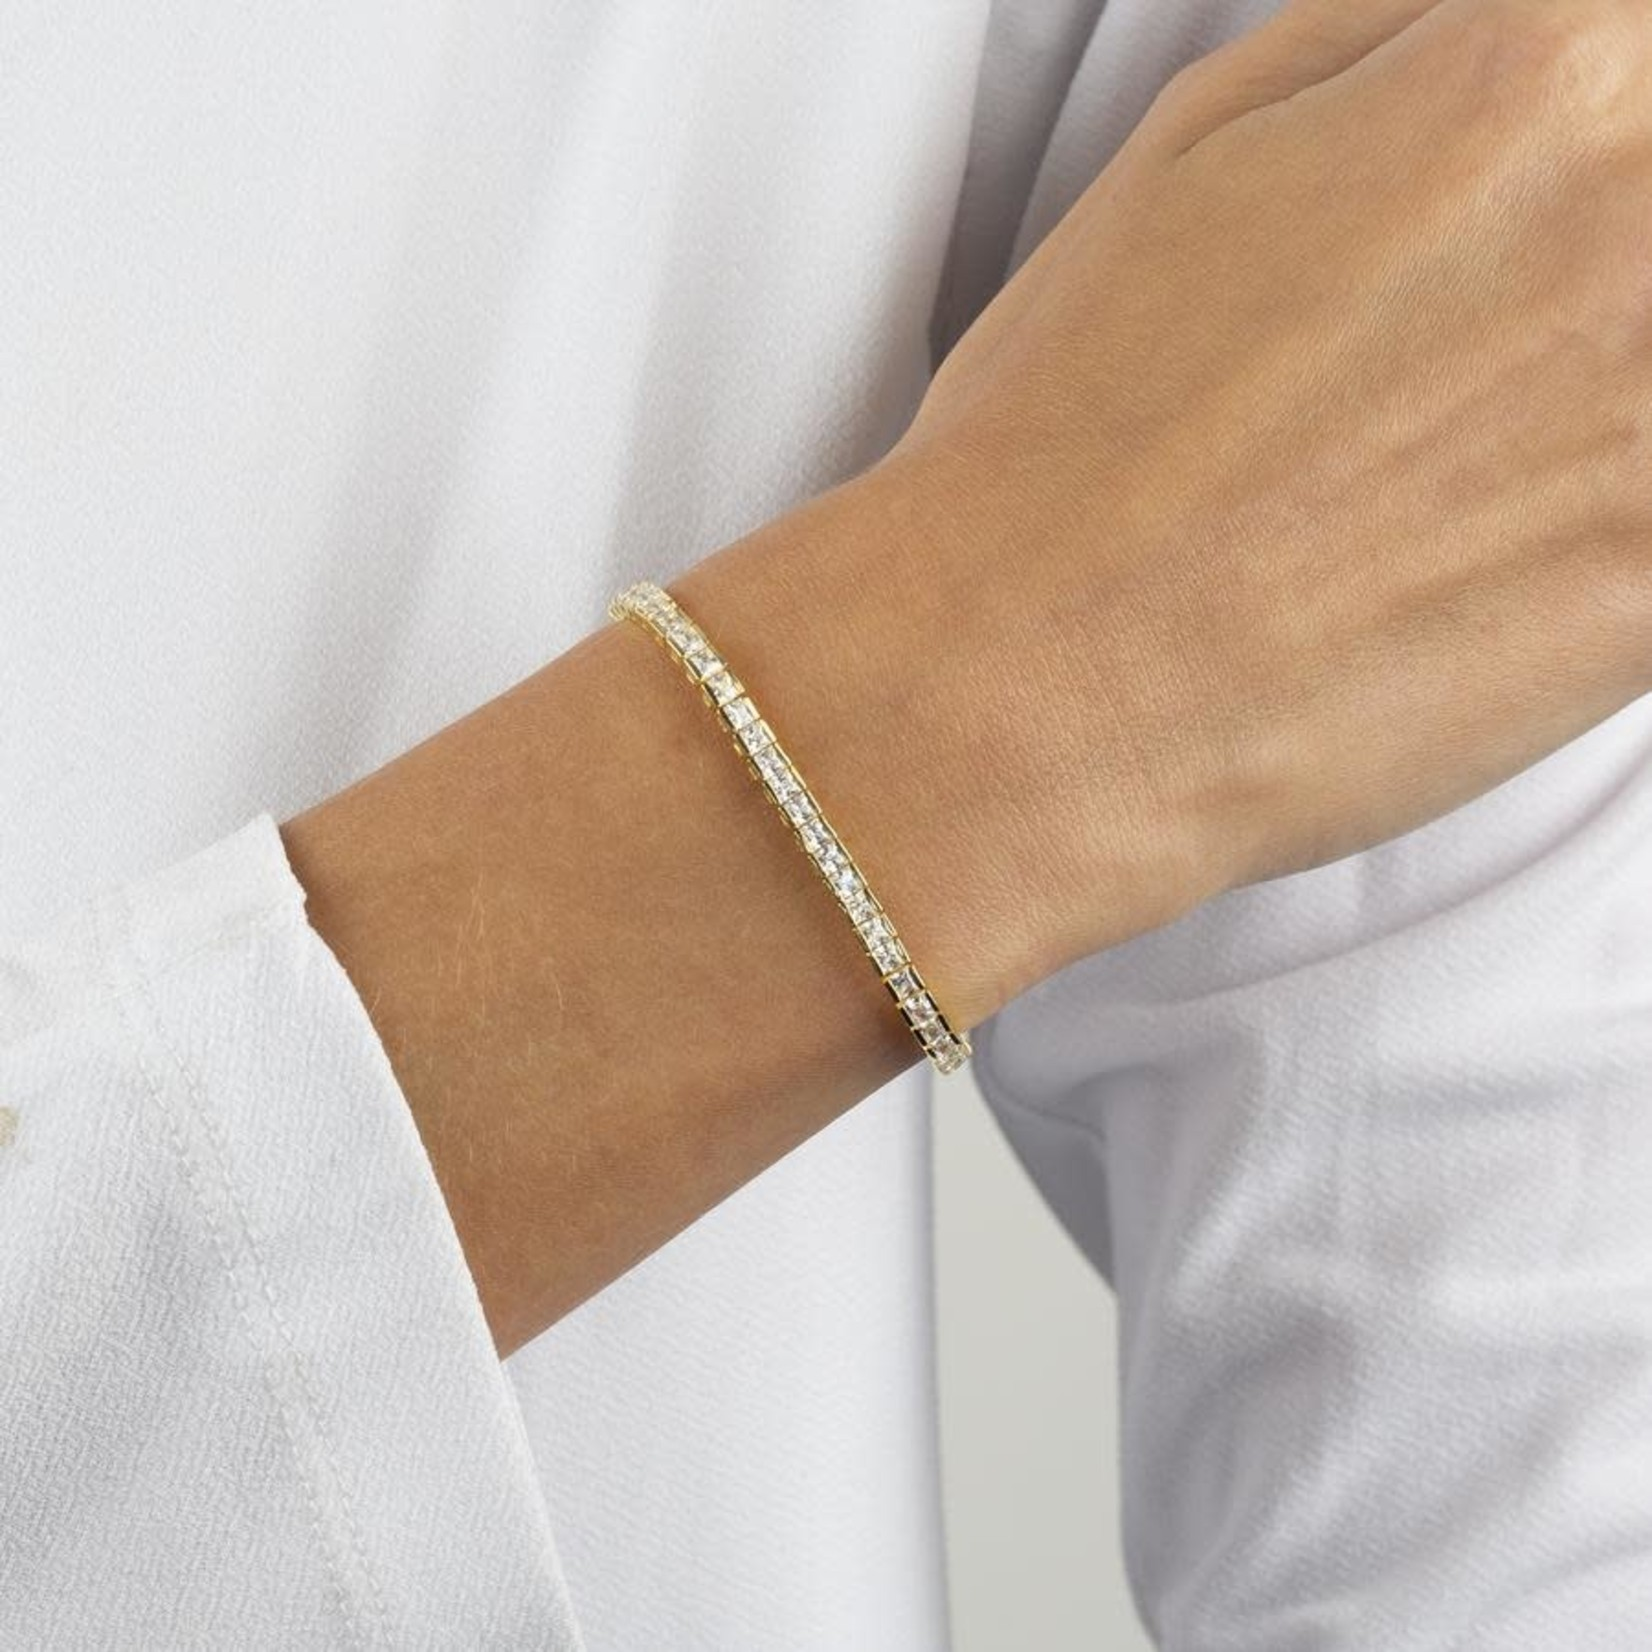 Adinas Princess Cut Tennis Bracelet